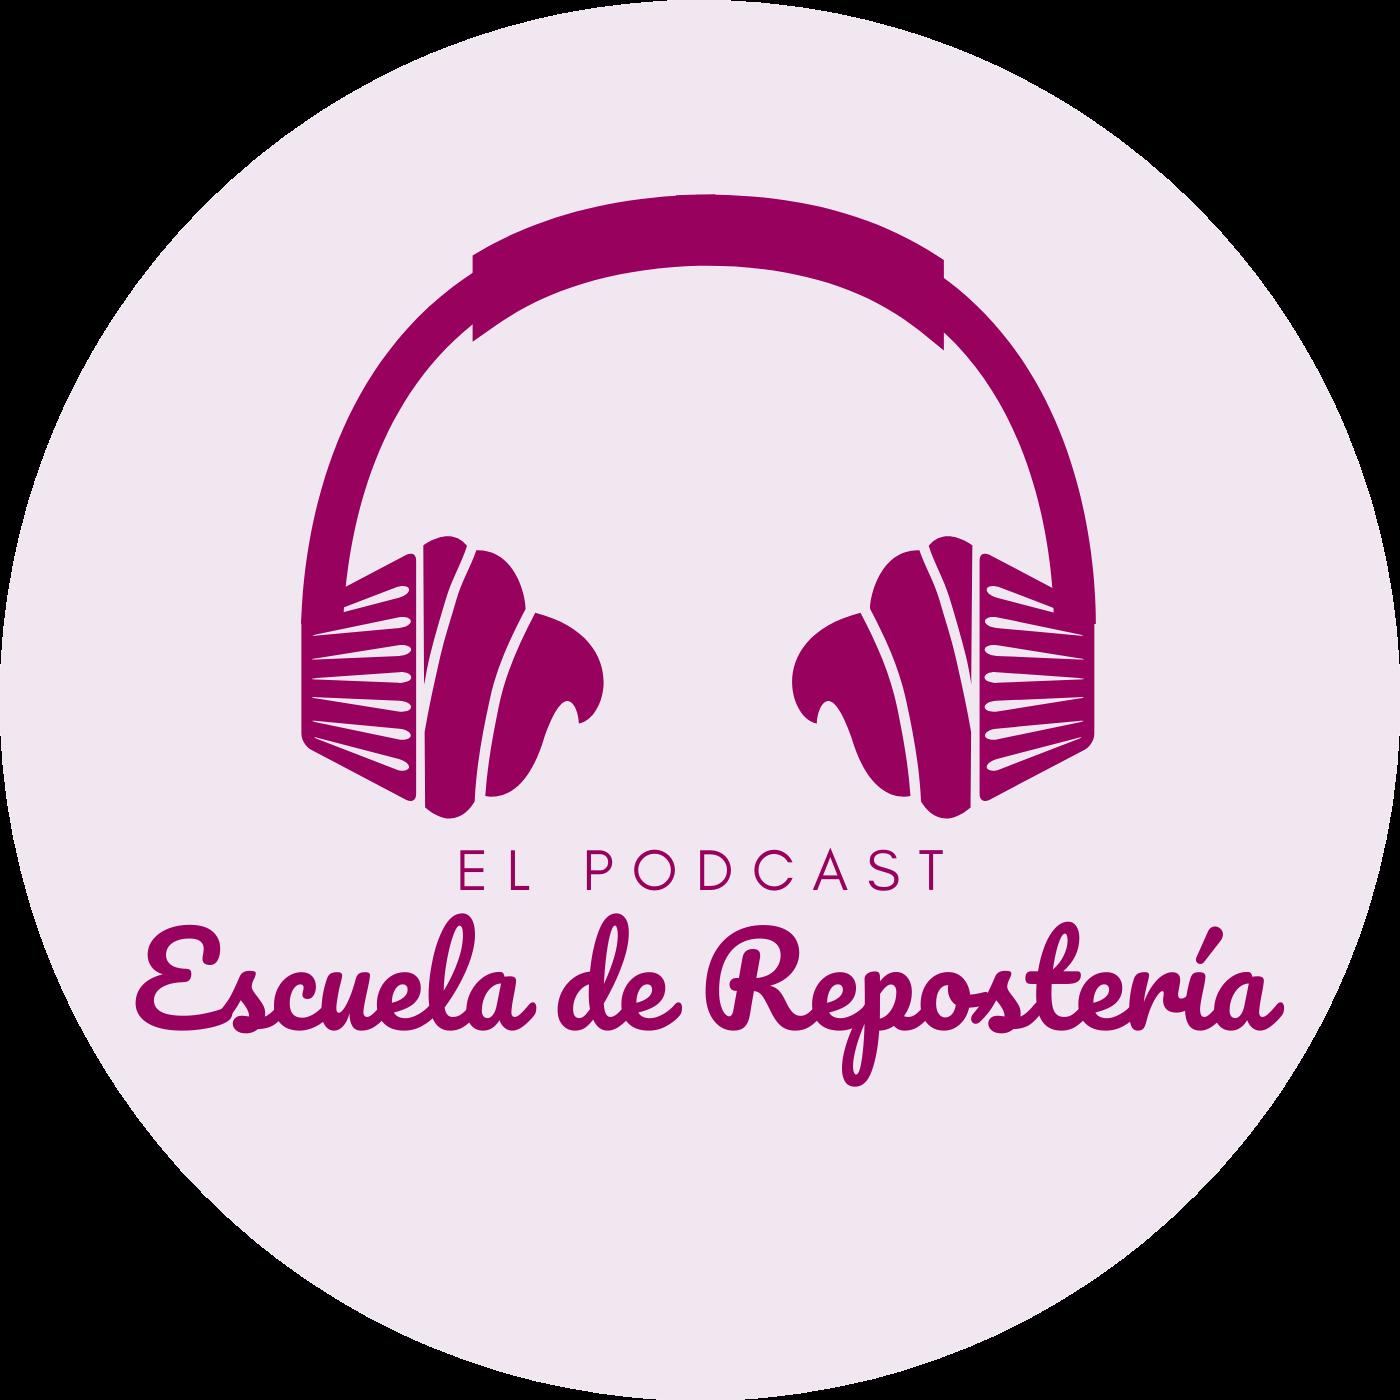 @escueladereposteriapodcast Profile Image | Linktree